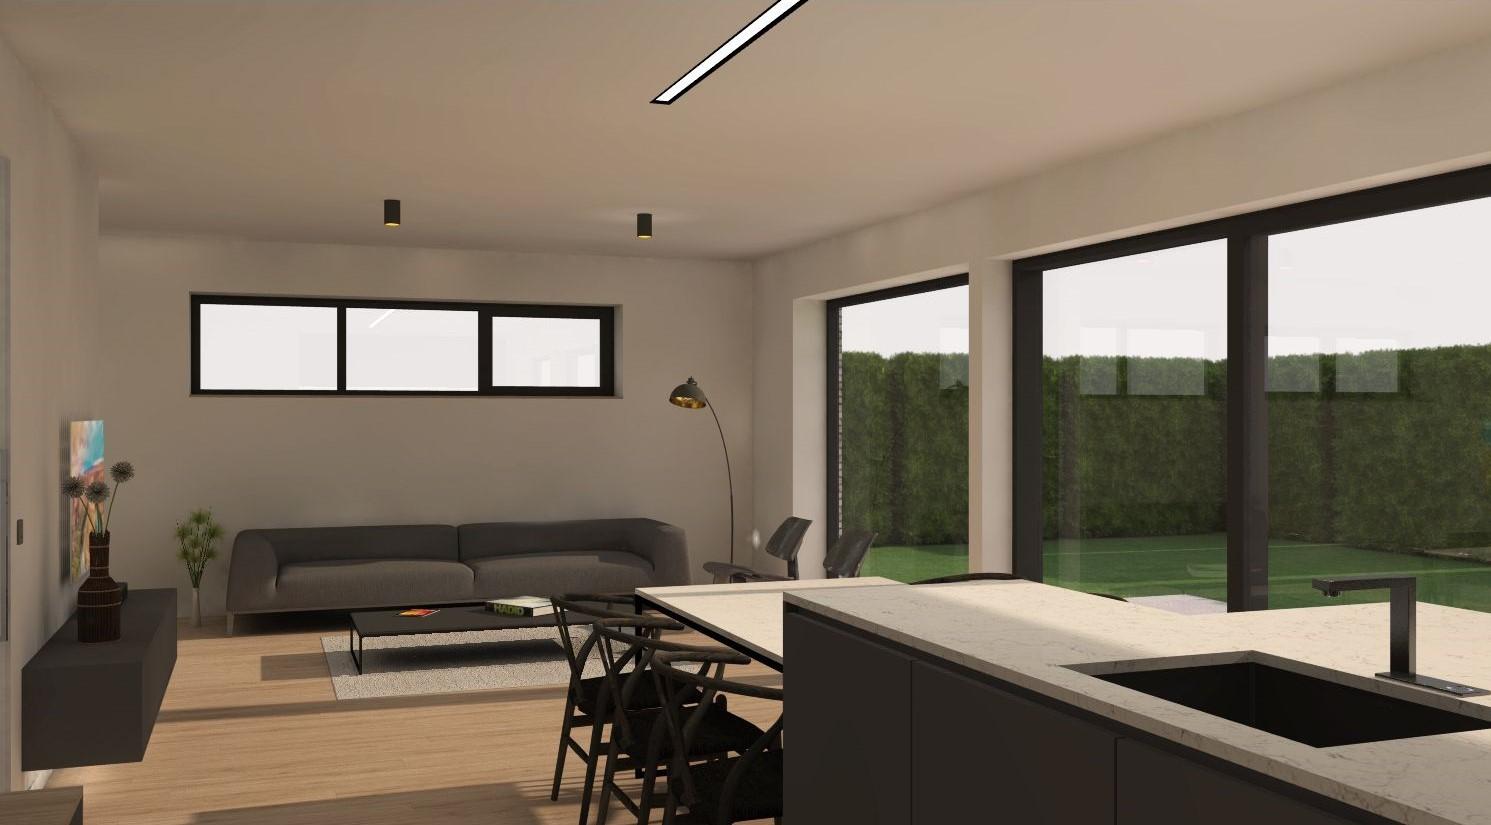 Lot 08 Moderne open bebouwing te Aarschot